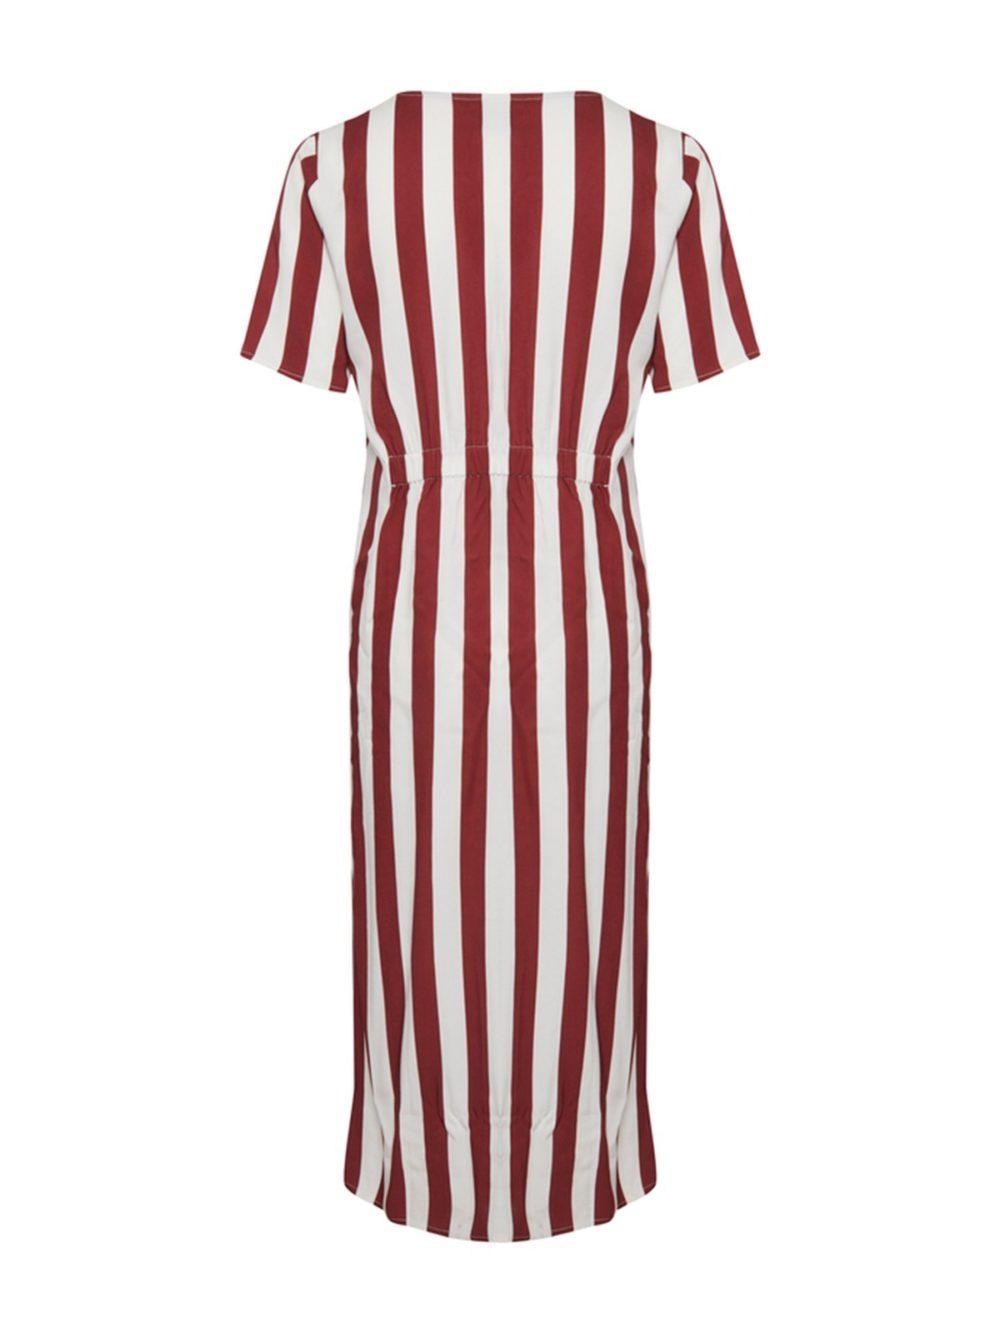 Caterina Dress ICHI Katie Kerr Women's Clothing